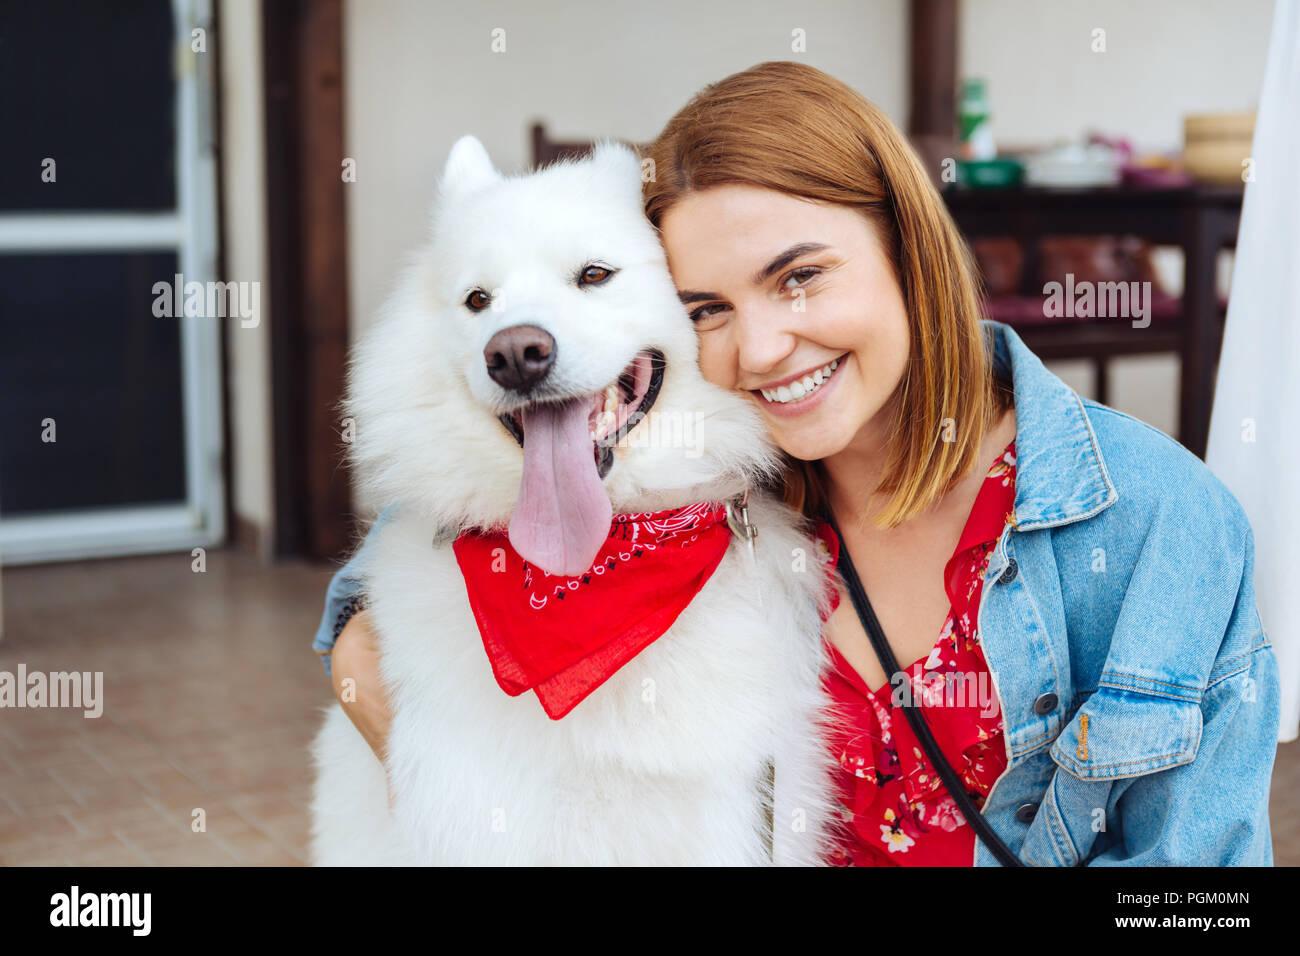 Dark-eyed woman smiling while hugging her cute husky - Stock Image